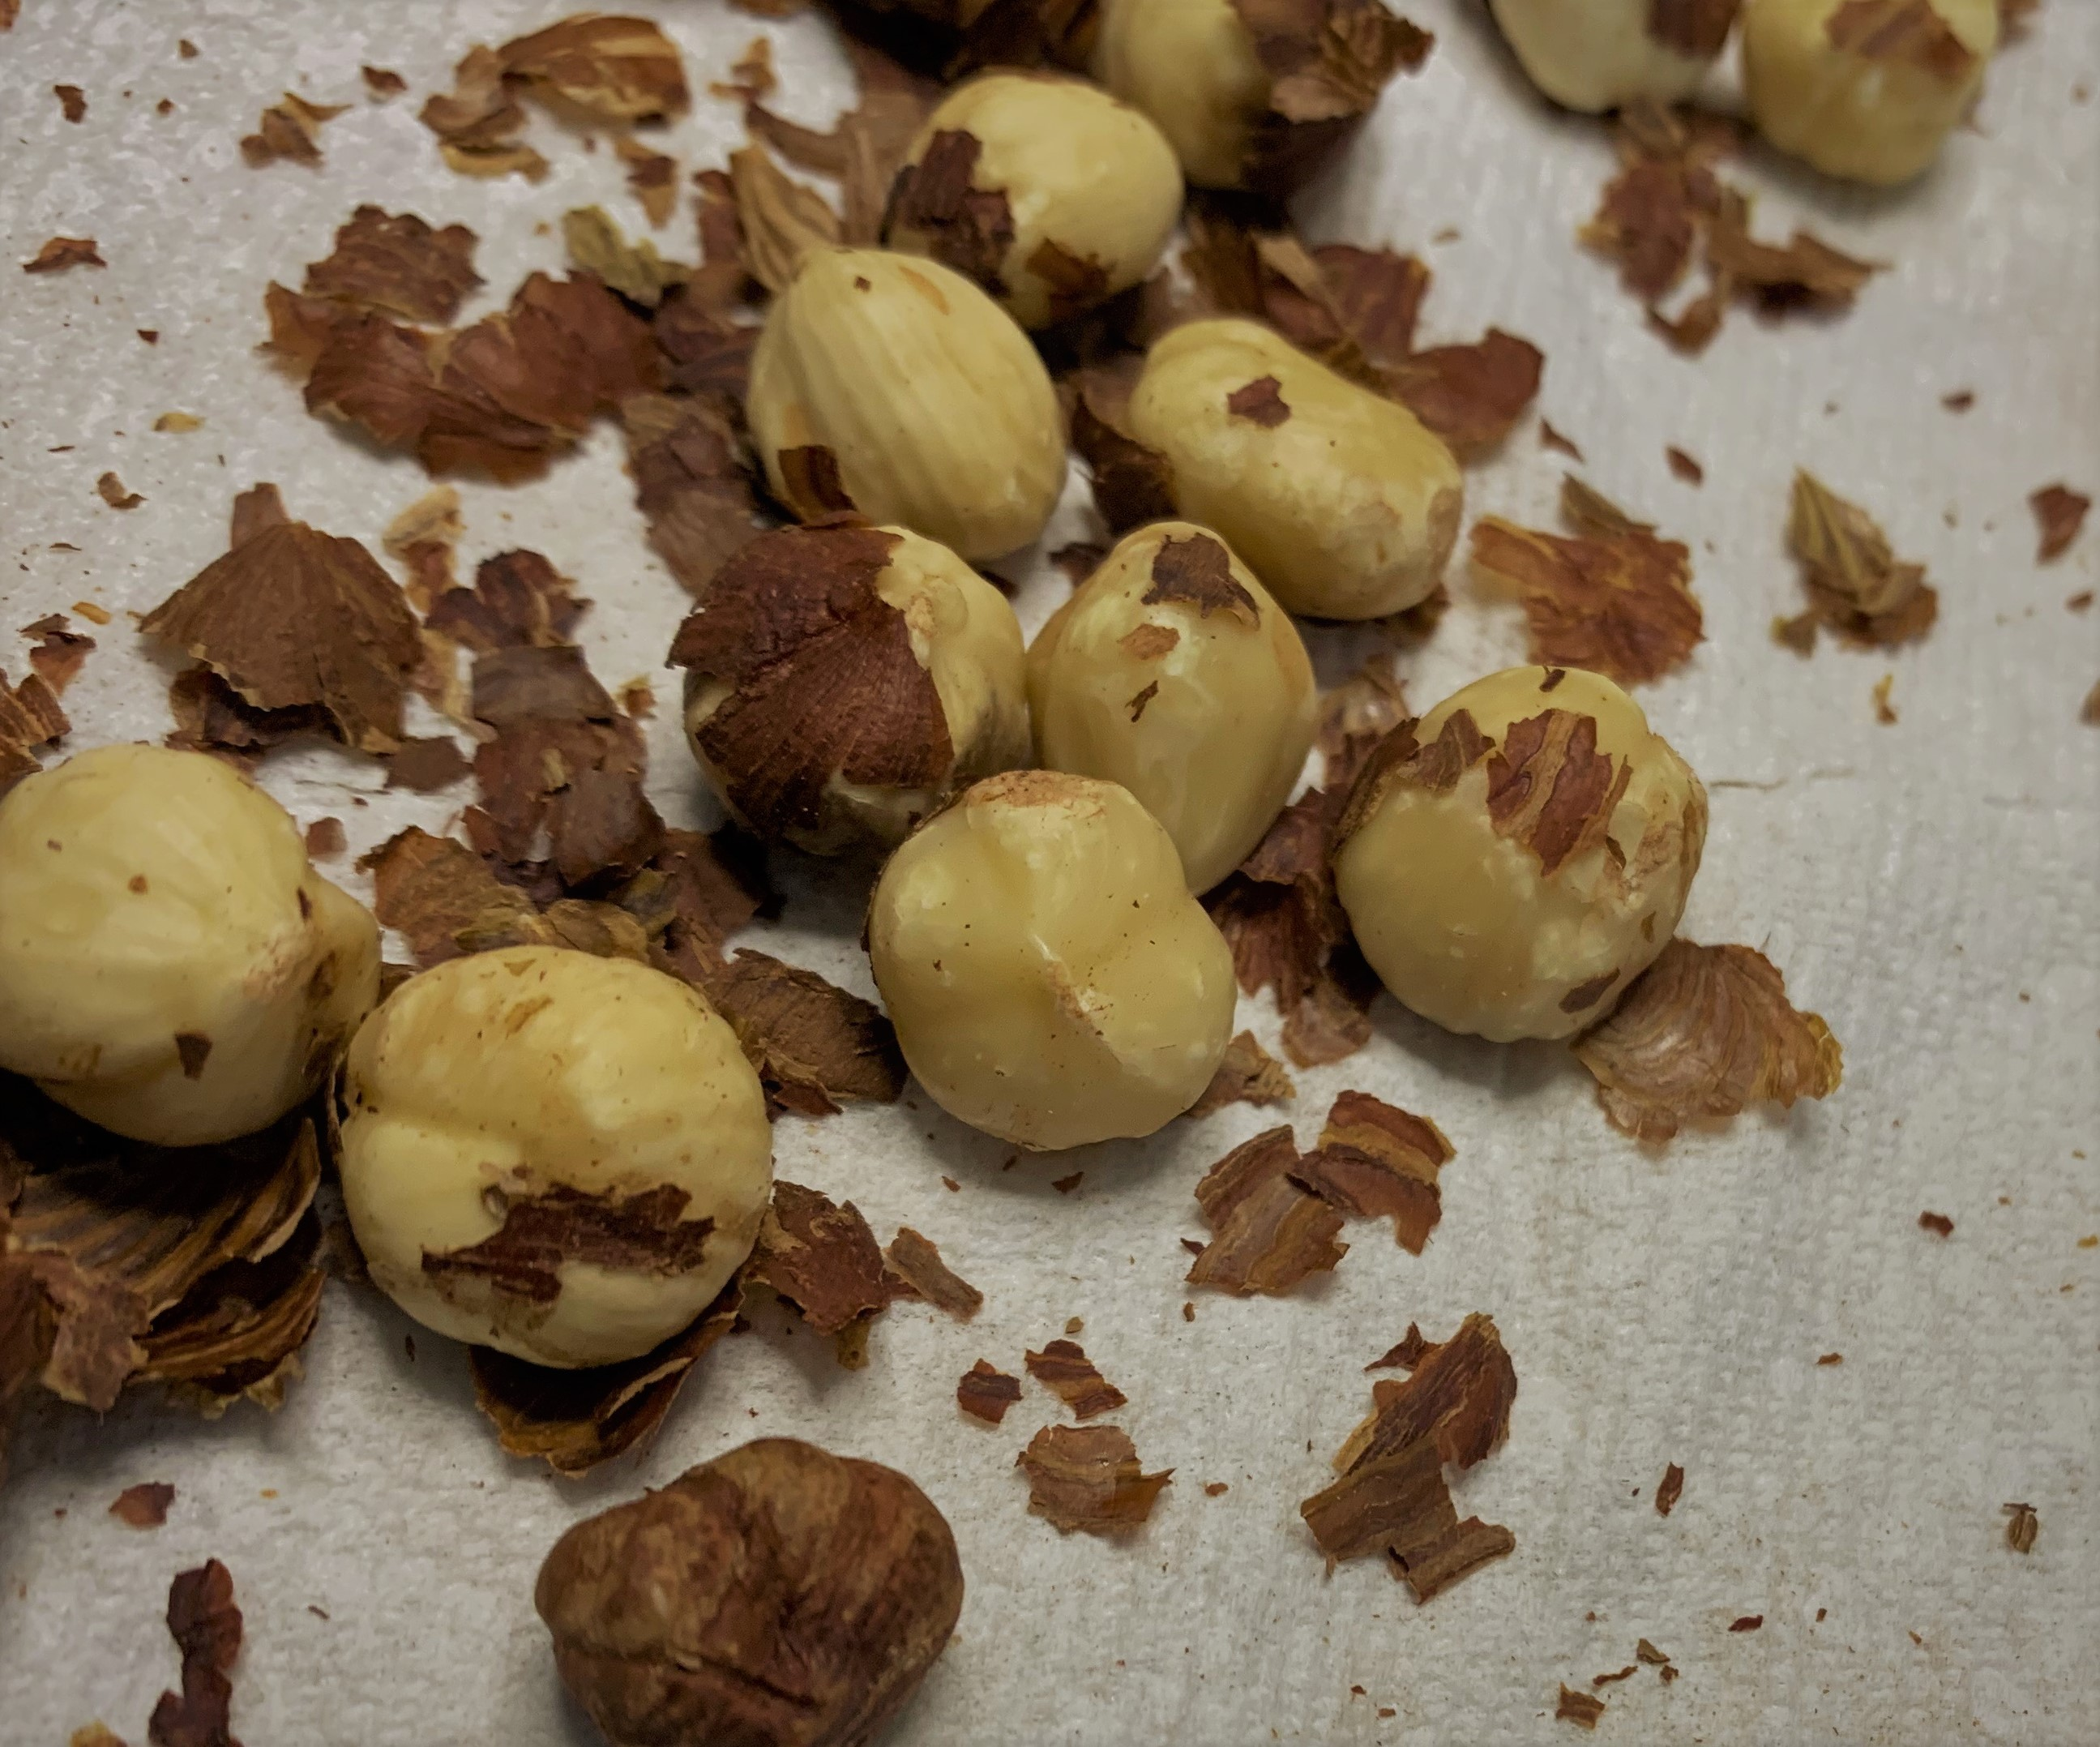 Peeling the Hazelnuts